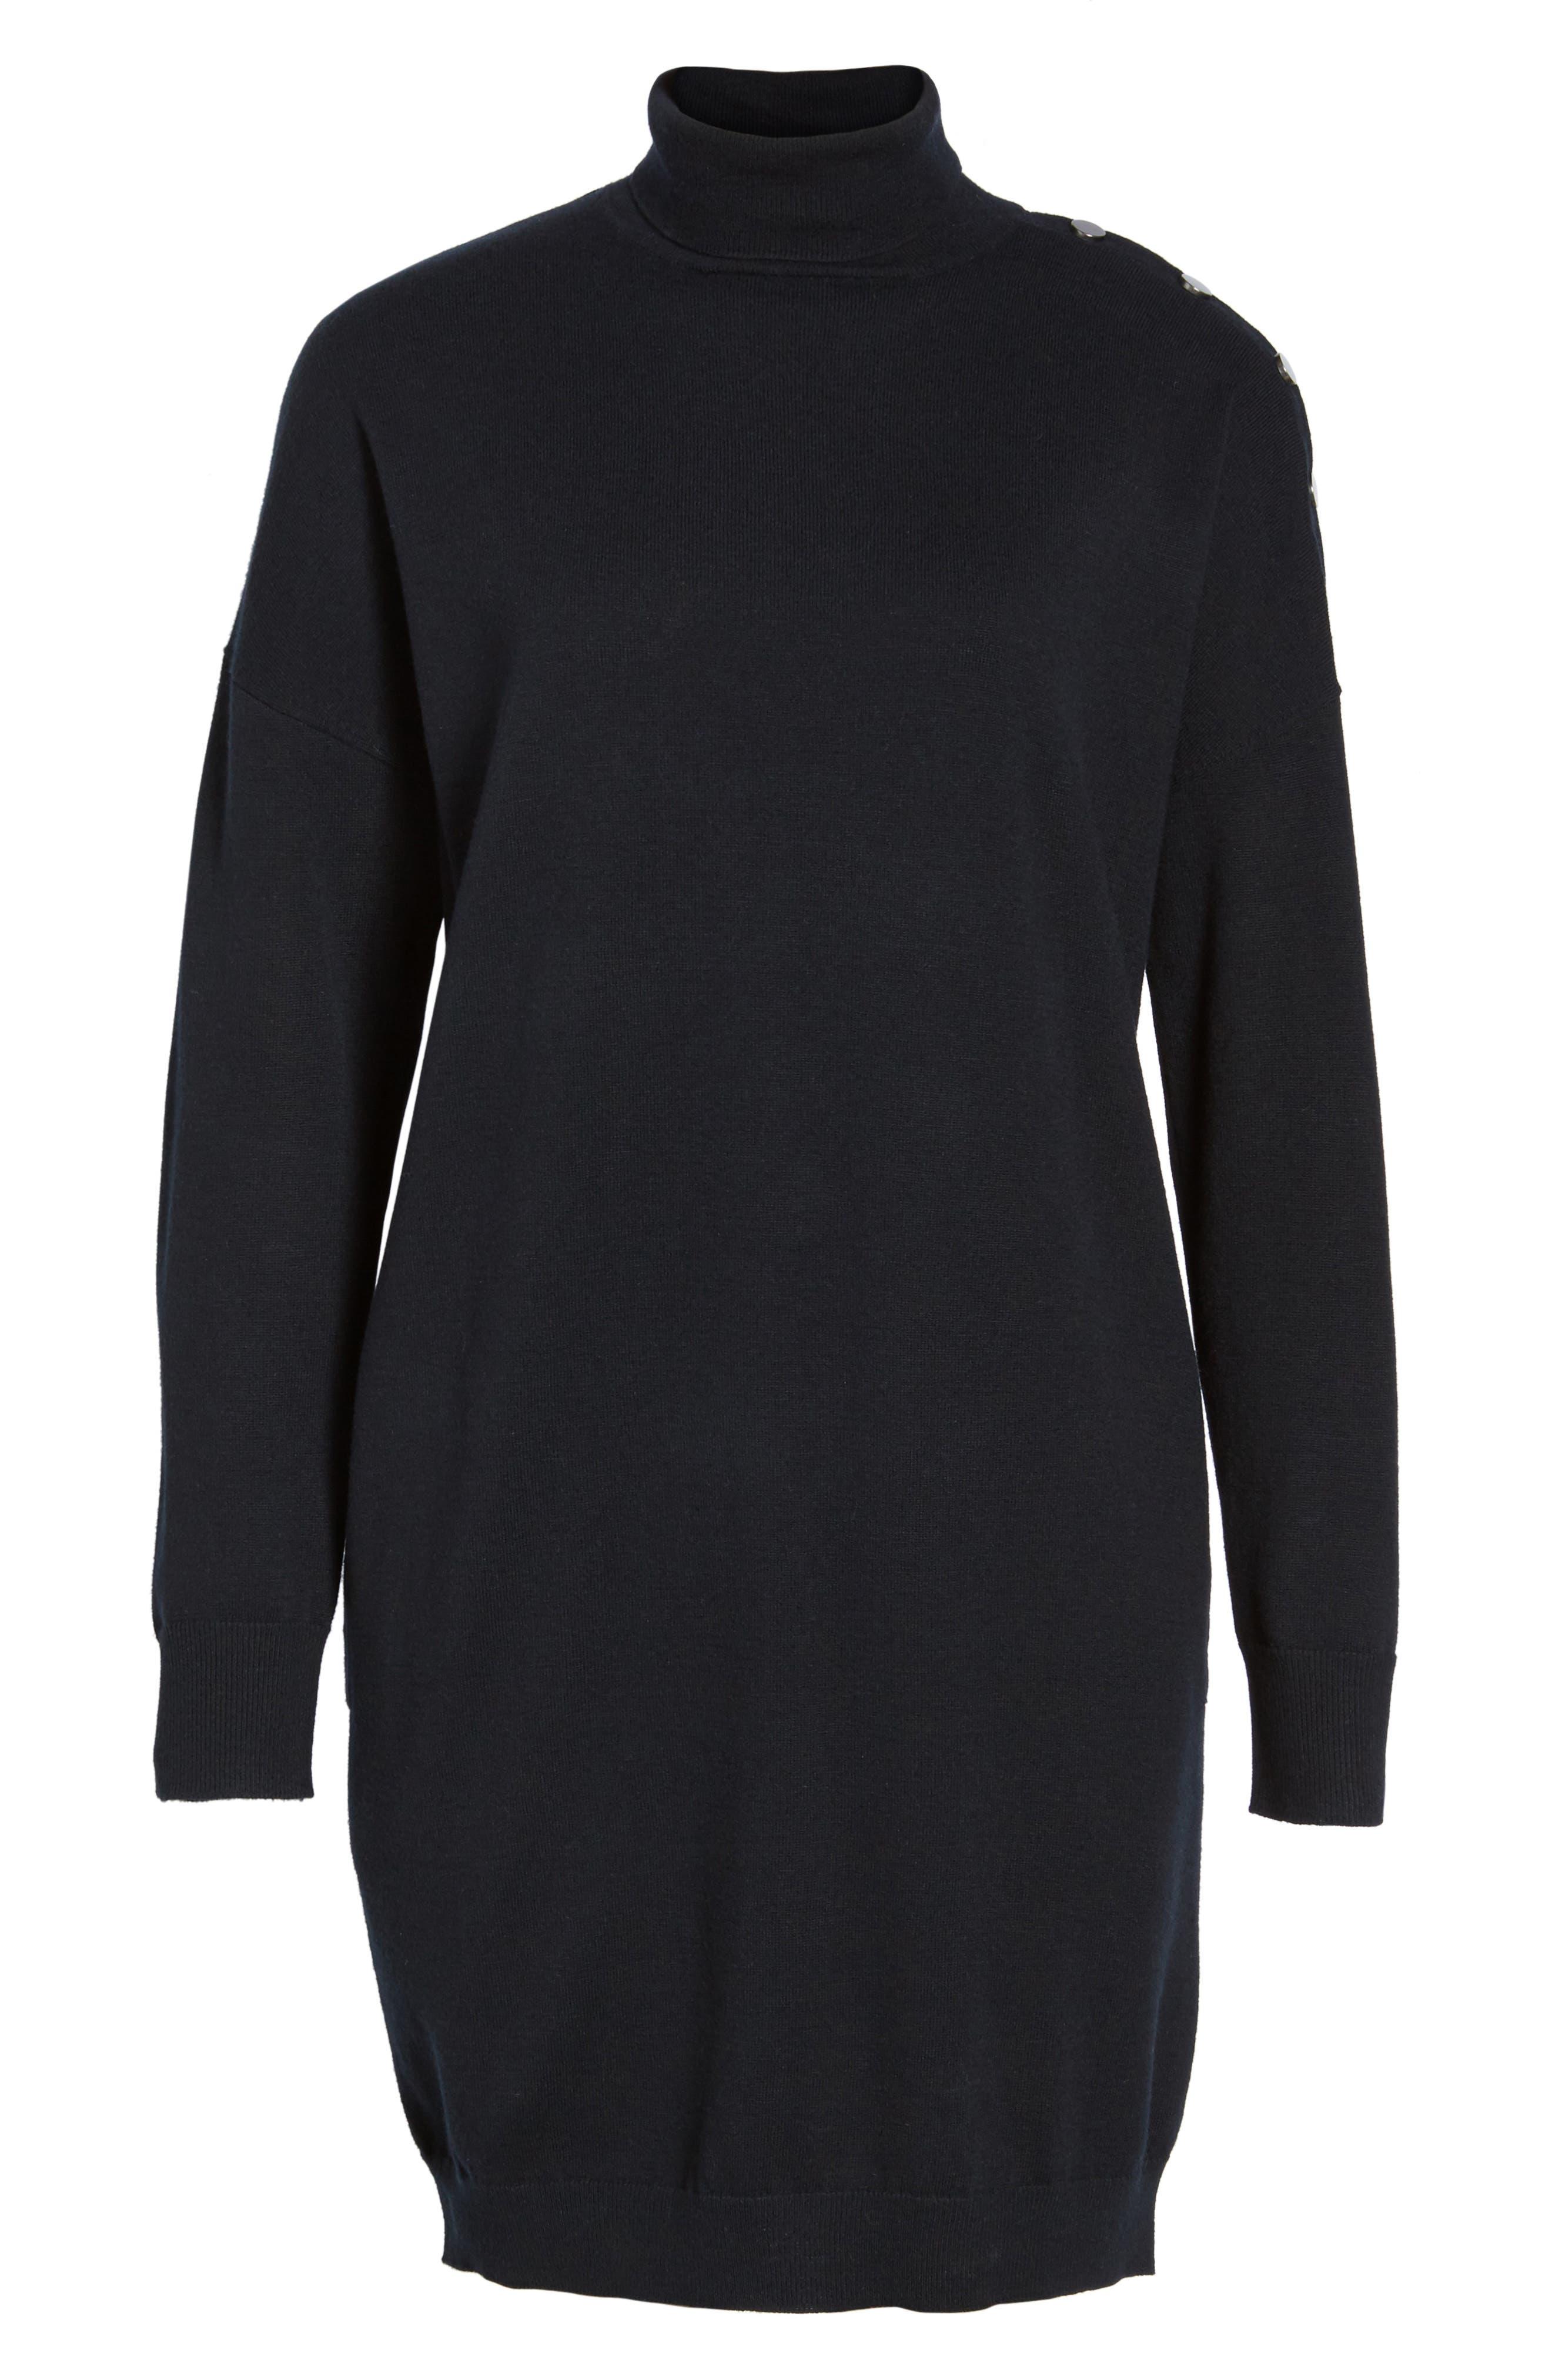 Marissa Sweater Dress,                             Alternate thumbnail 6, color,                             001